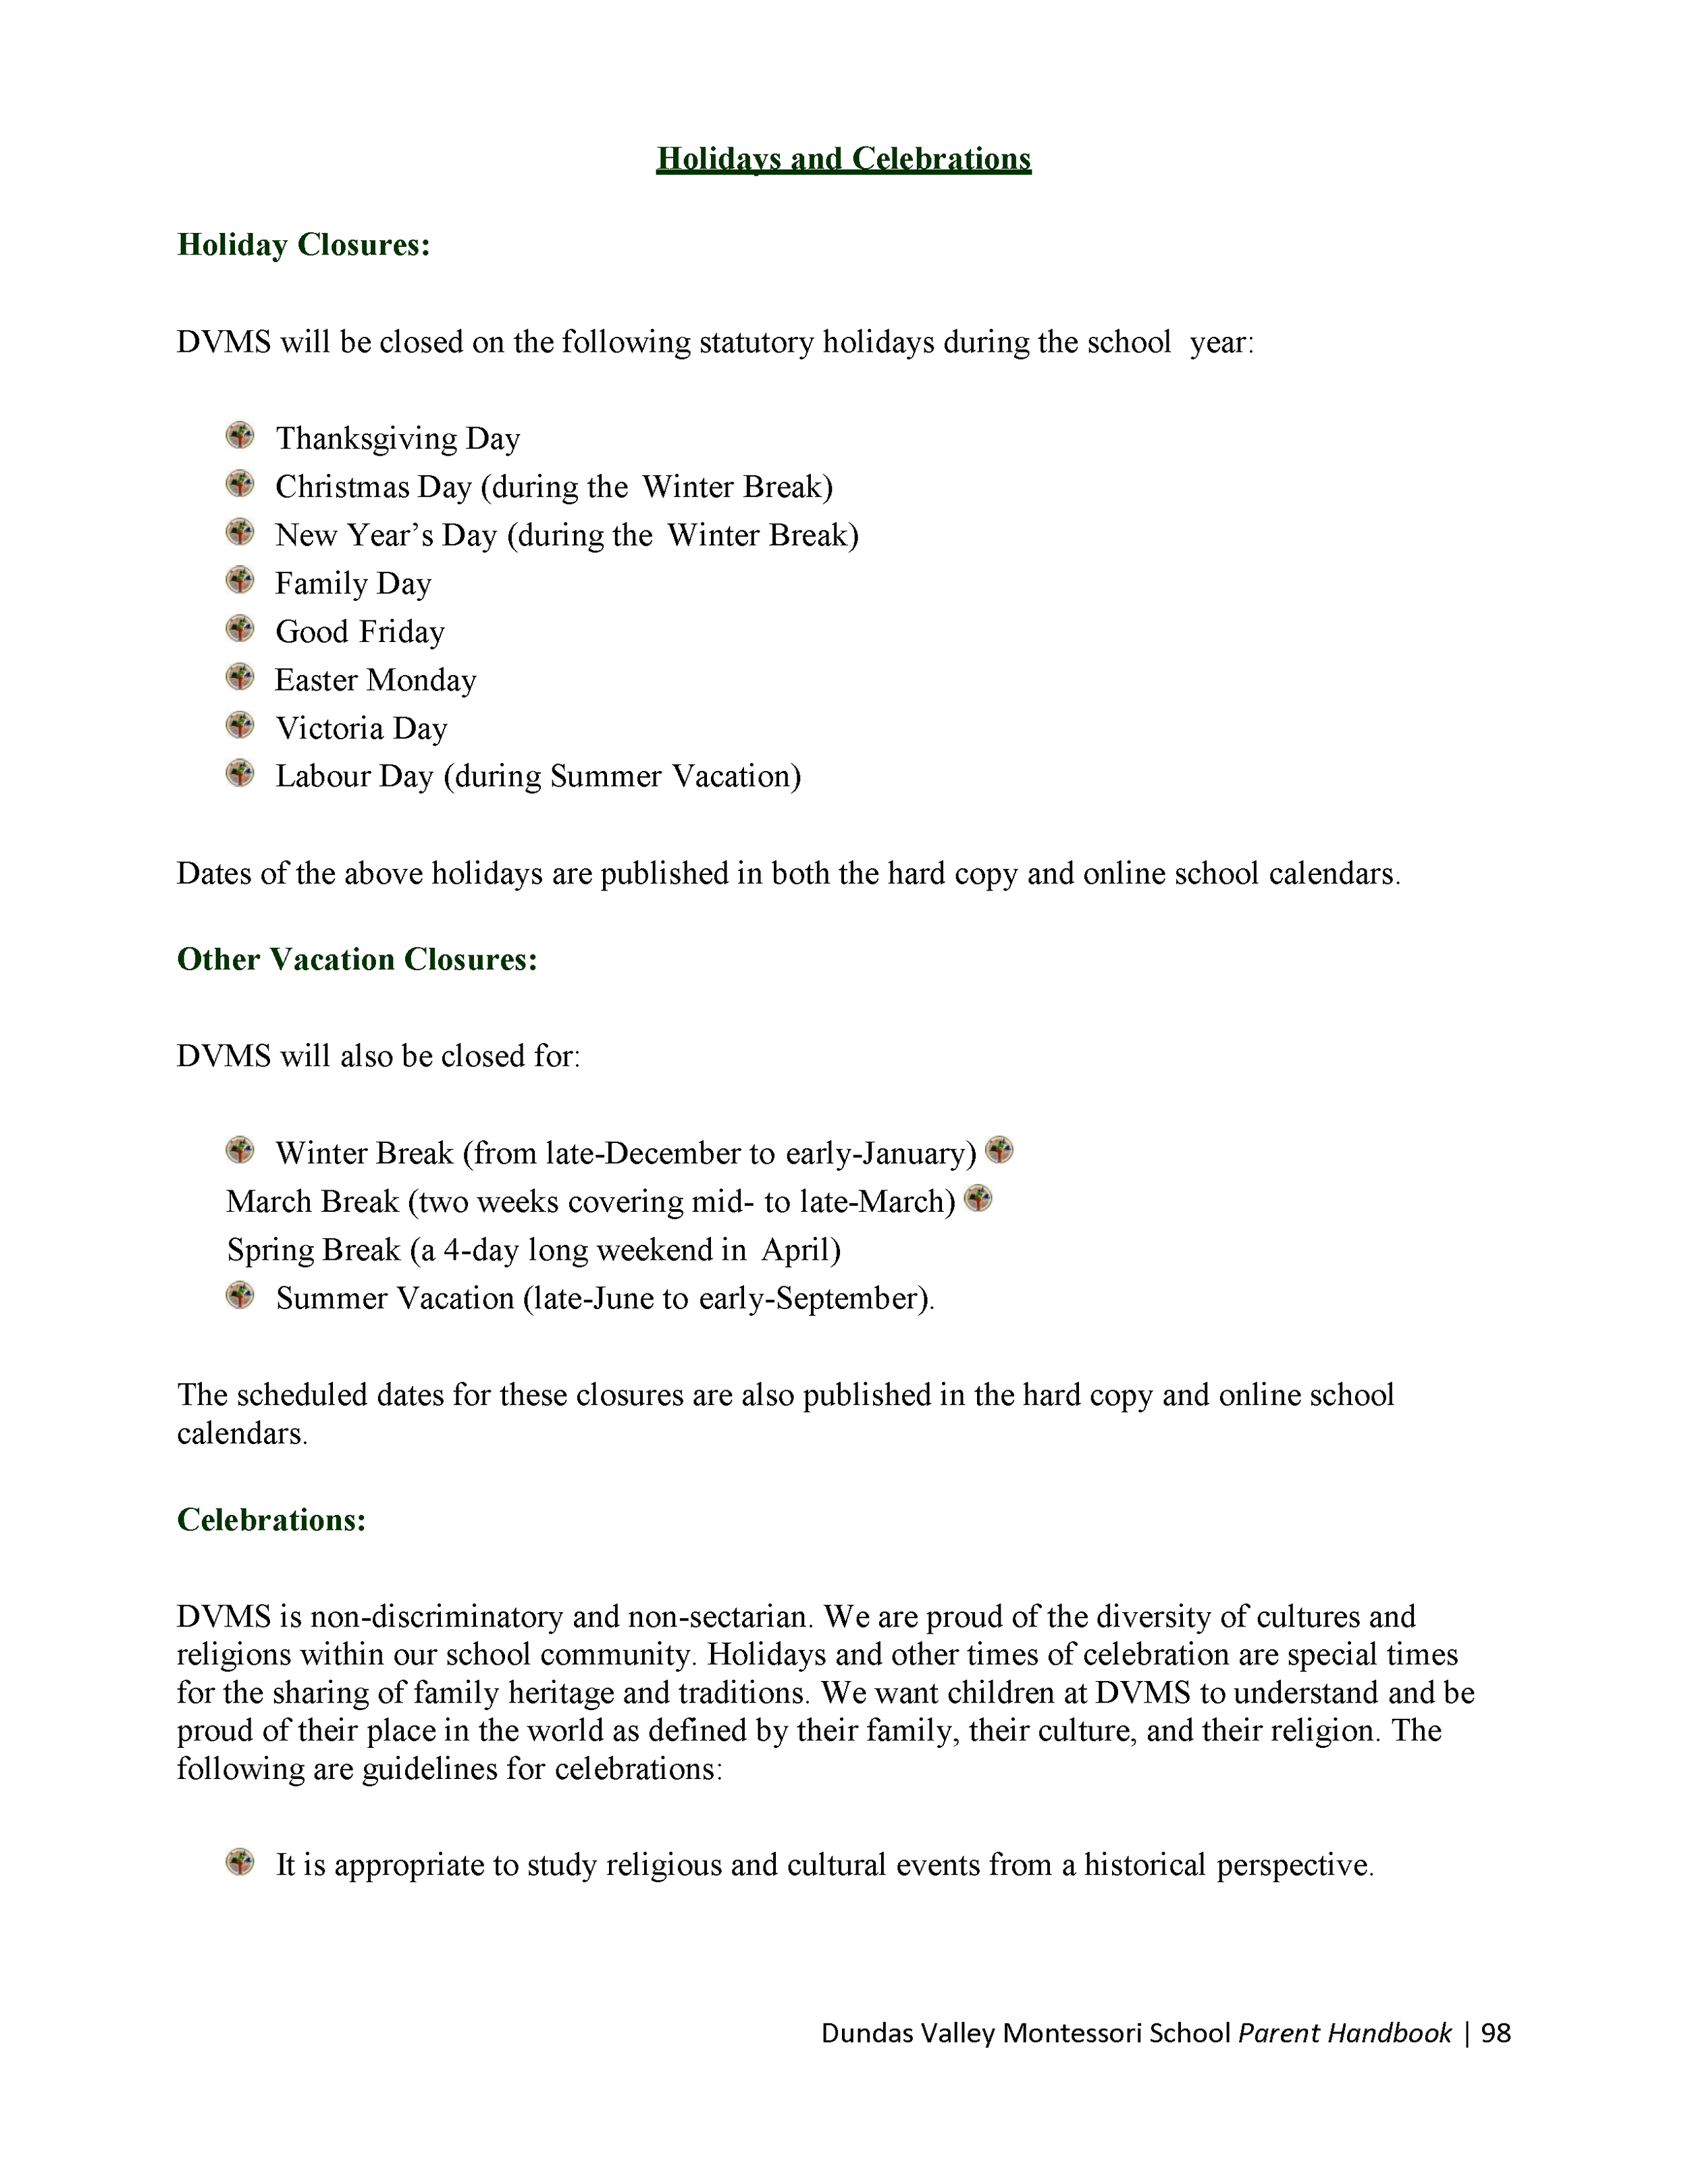 DVMS-Parent-Handbook-19-20_Page_100.png